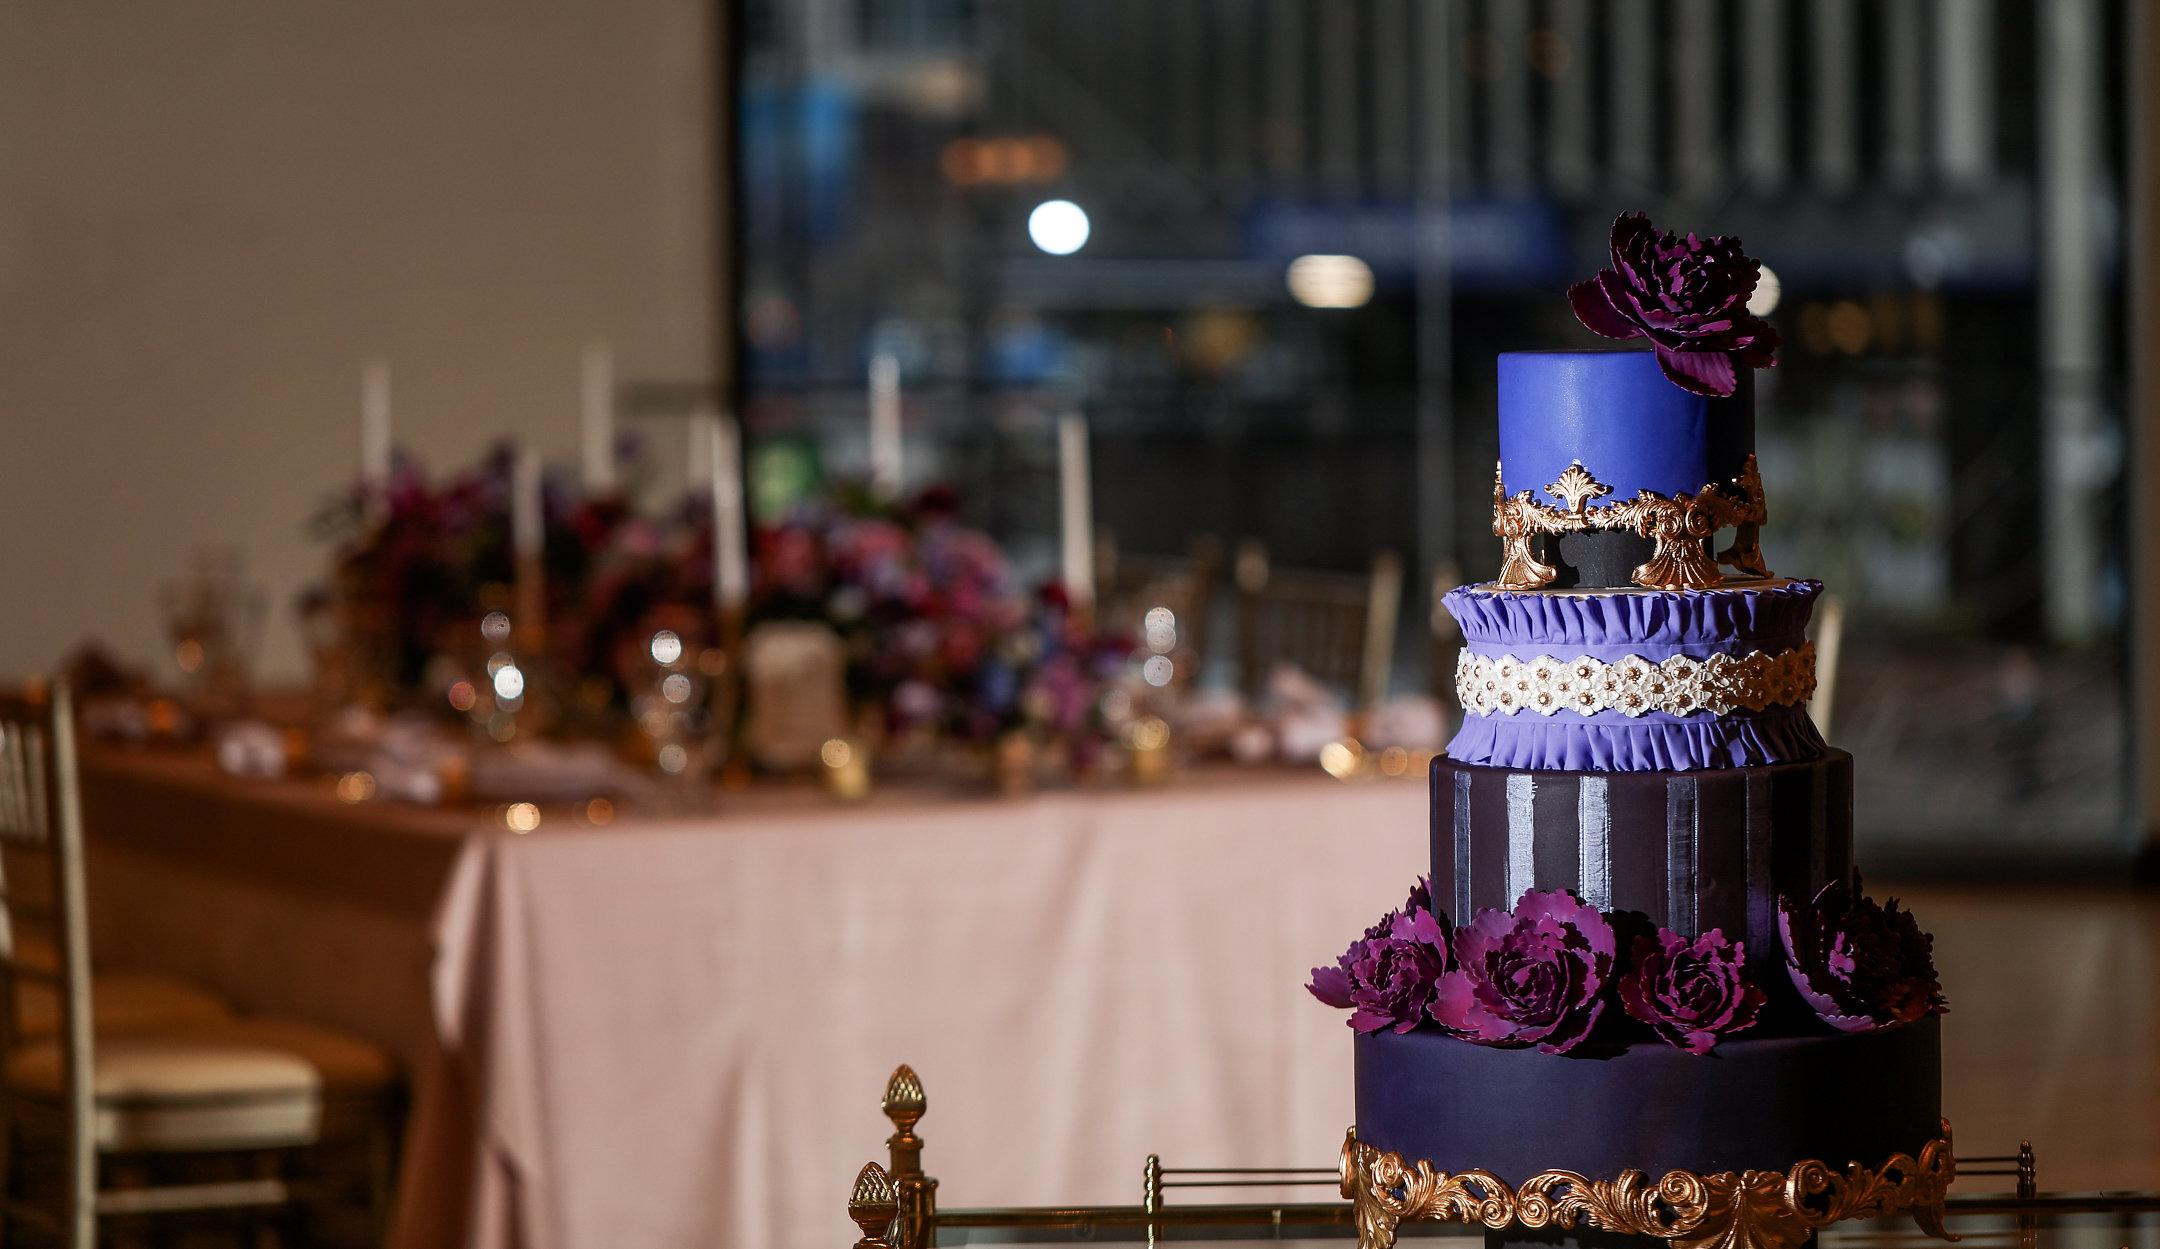 Purple Wedding Cake - Columbus Weddings - Cincy Bride - Dayton Wedding Planners - Dayton Bride